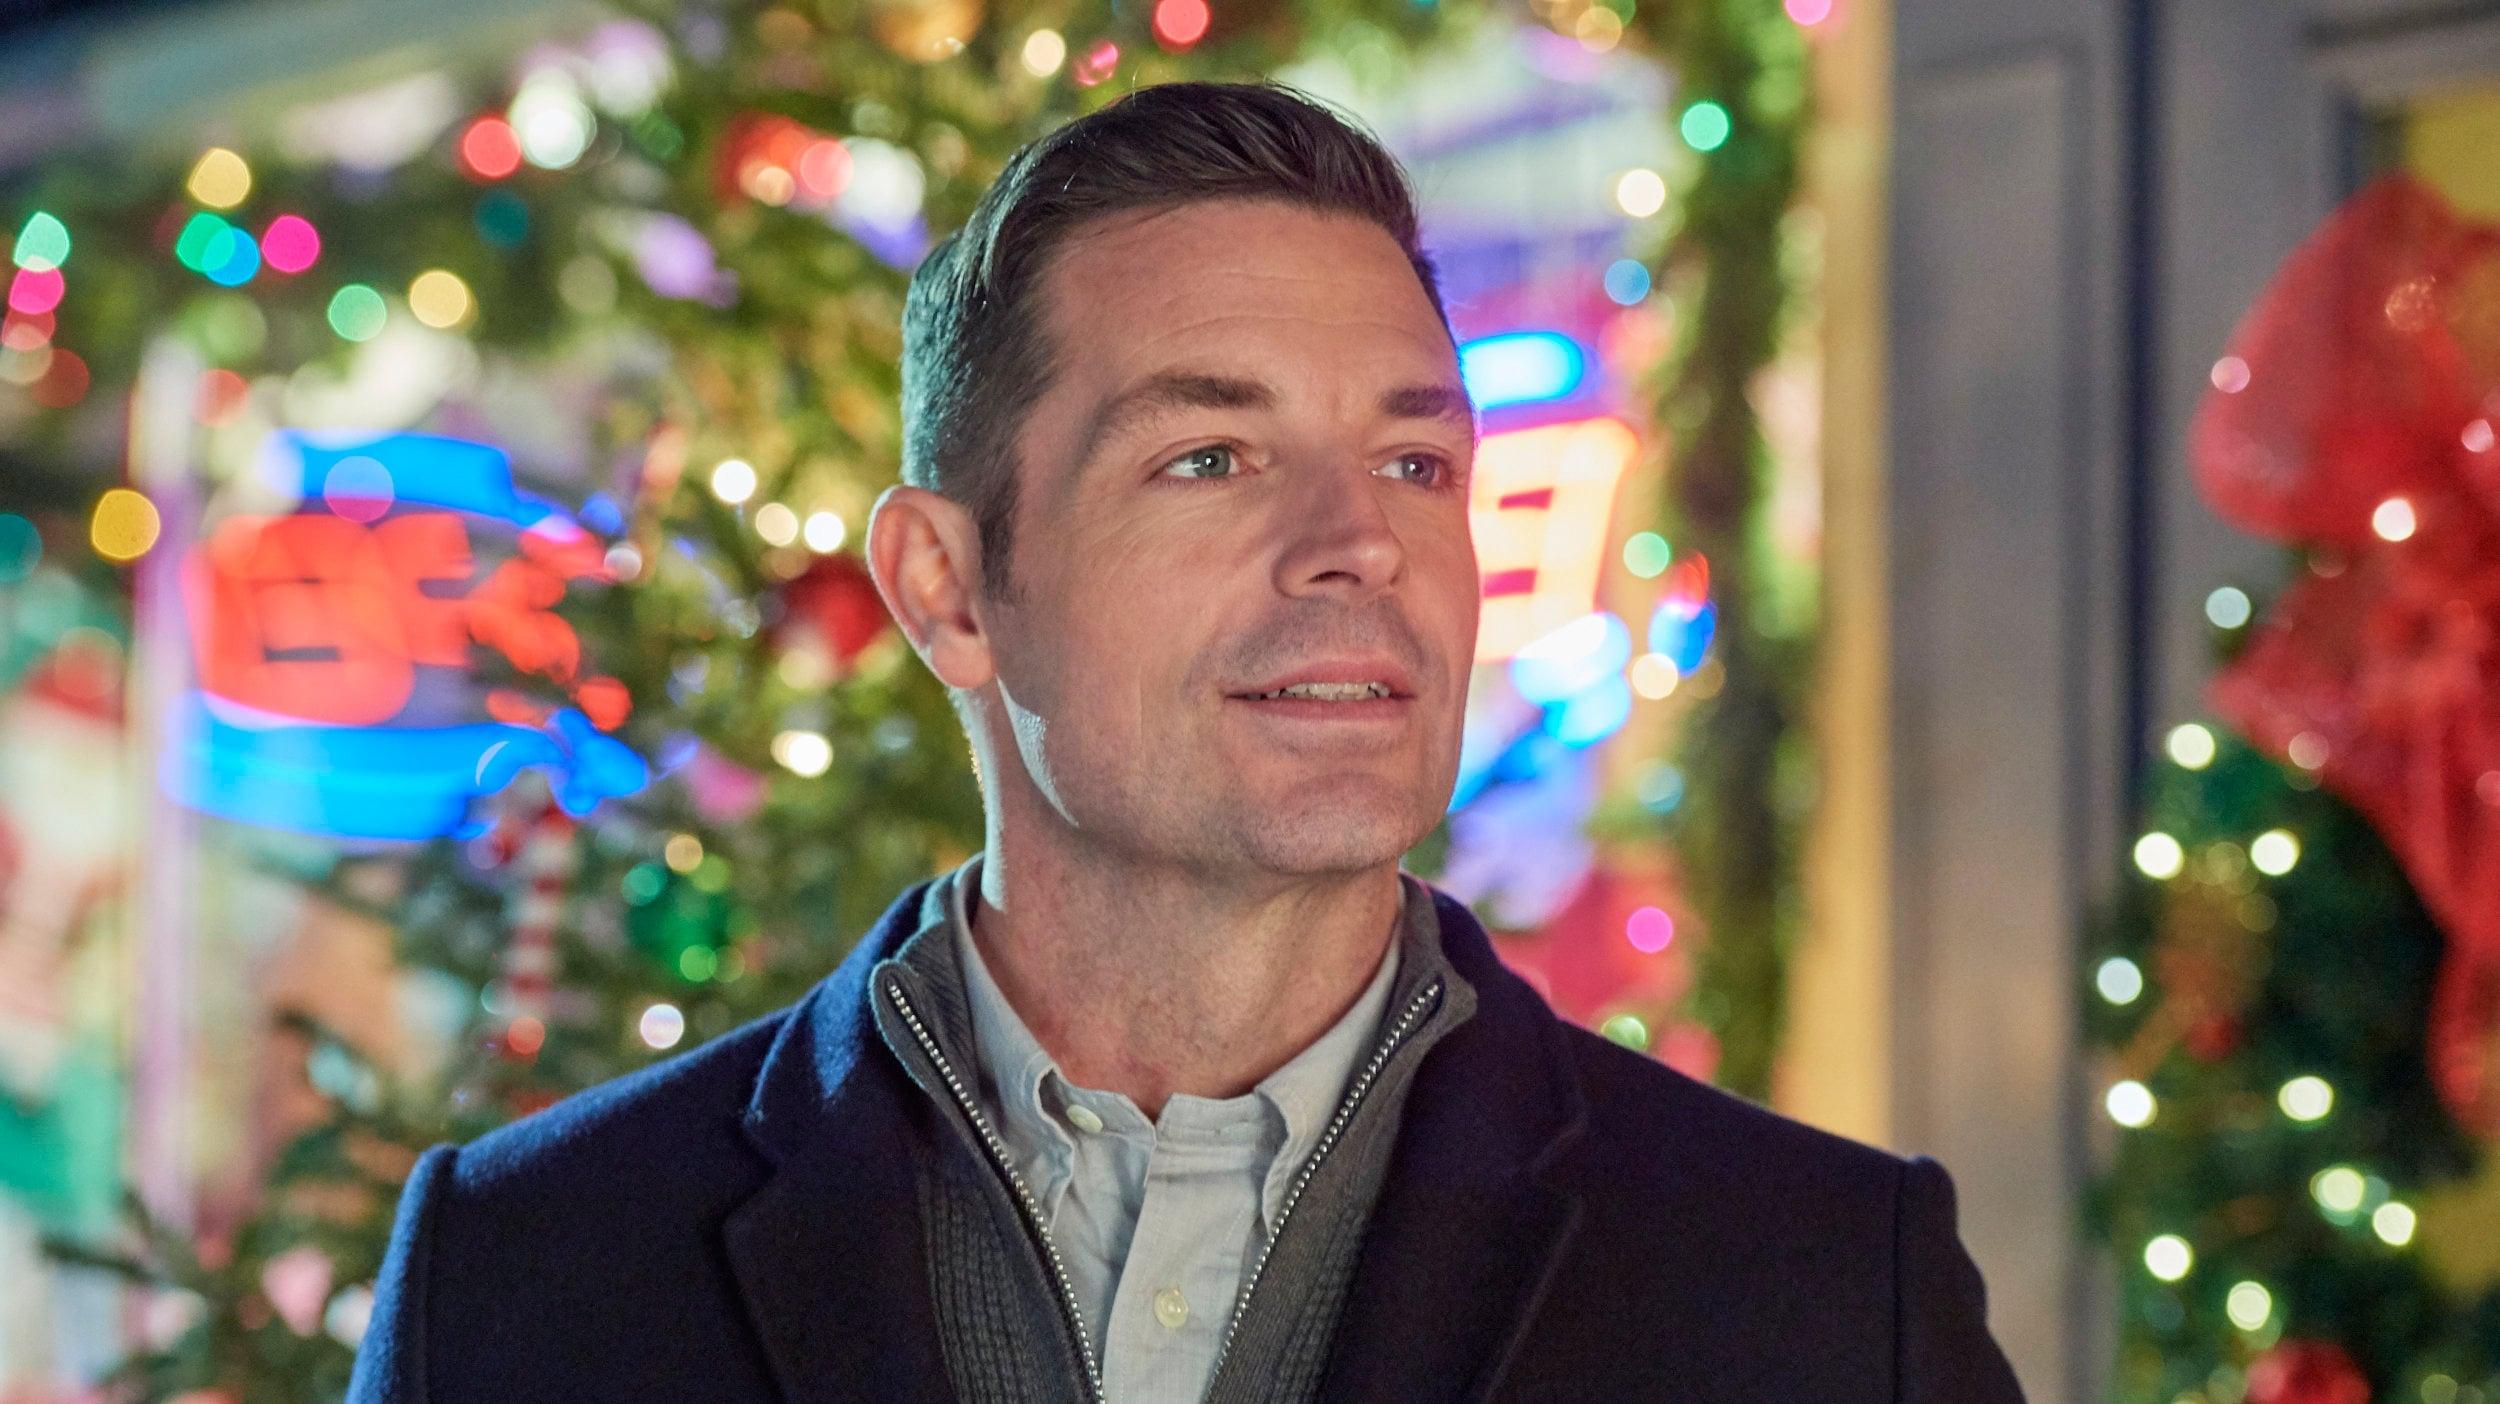 Święta w Grand Valley / Christmas at Grand Valley – cda 2018 | Cda-tv.pl - filmy i seriale online